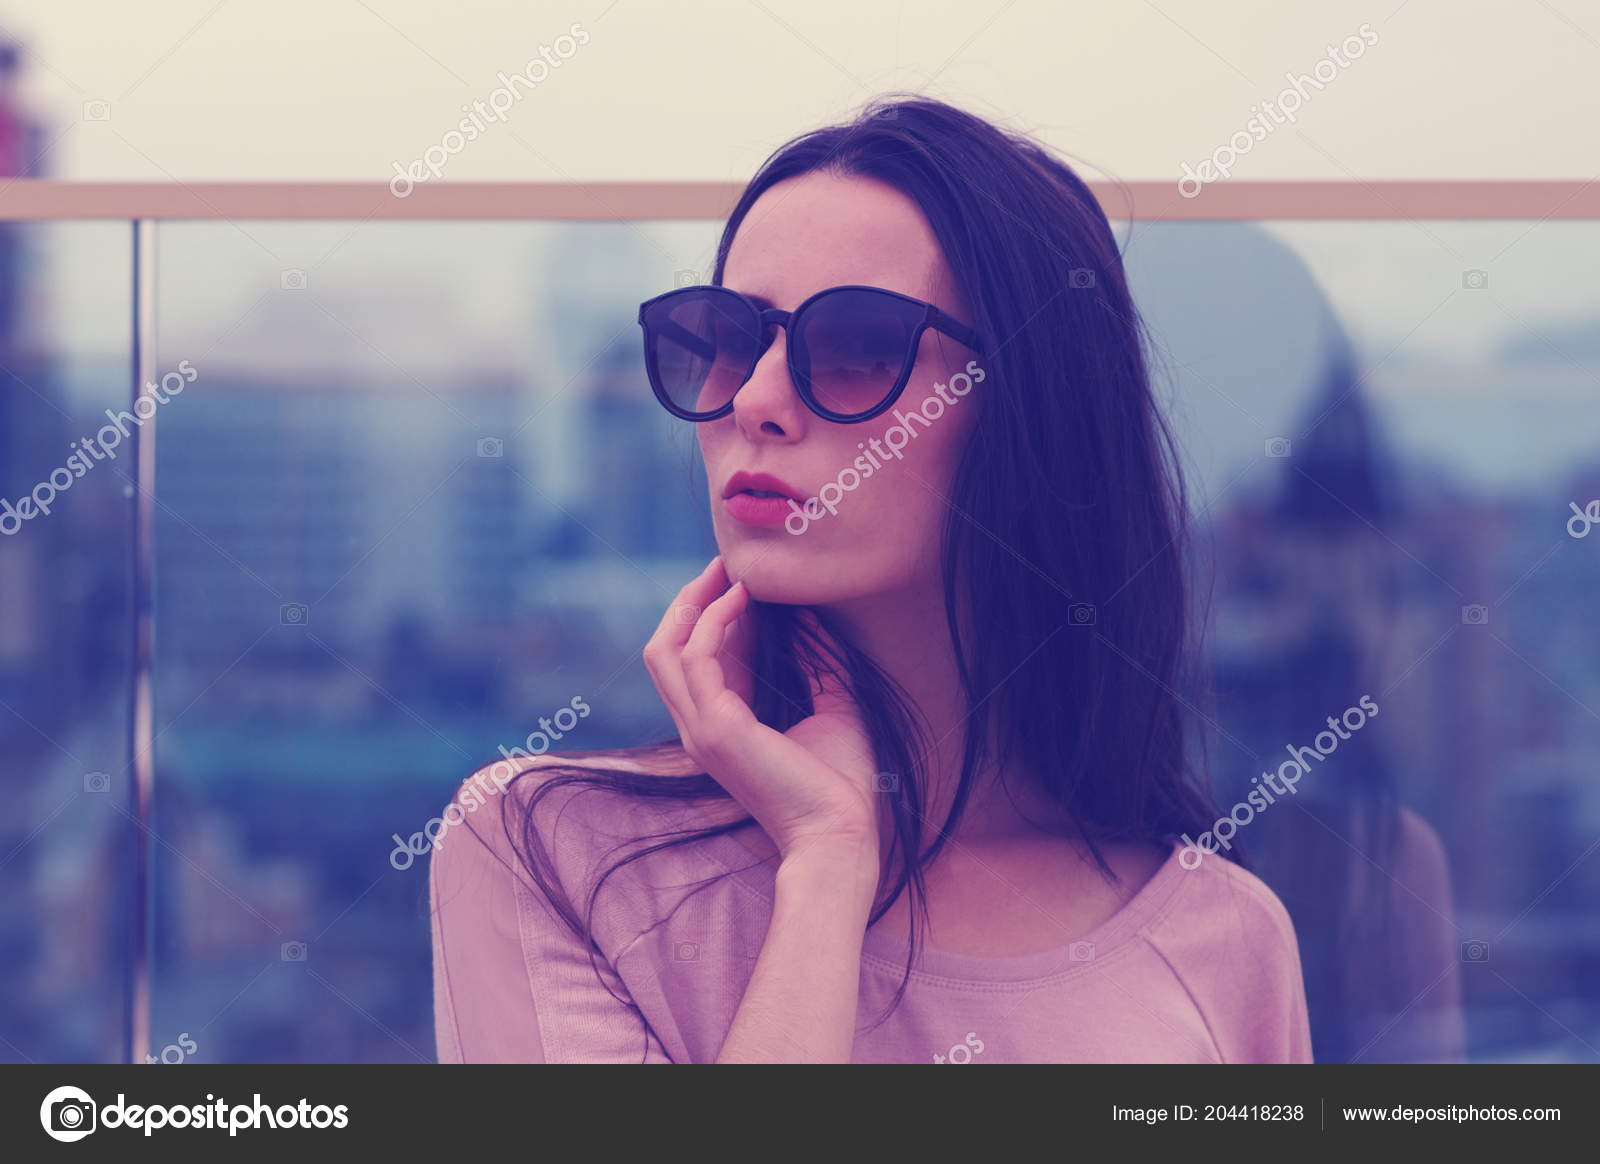 b5efebb659 Μακρυμάλλης νεαρή γυναίκα μελαχρινή ποζάρουν σε μεγάλα γυαλιά ηλίου.  Μοντέρνο στυλ με ροζ τόνους.